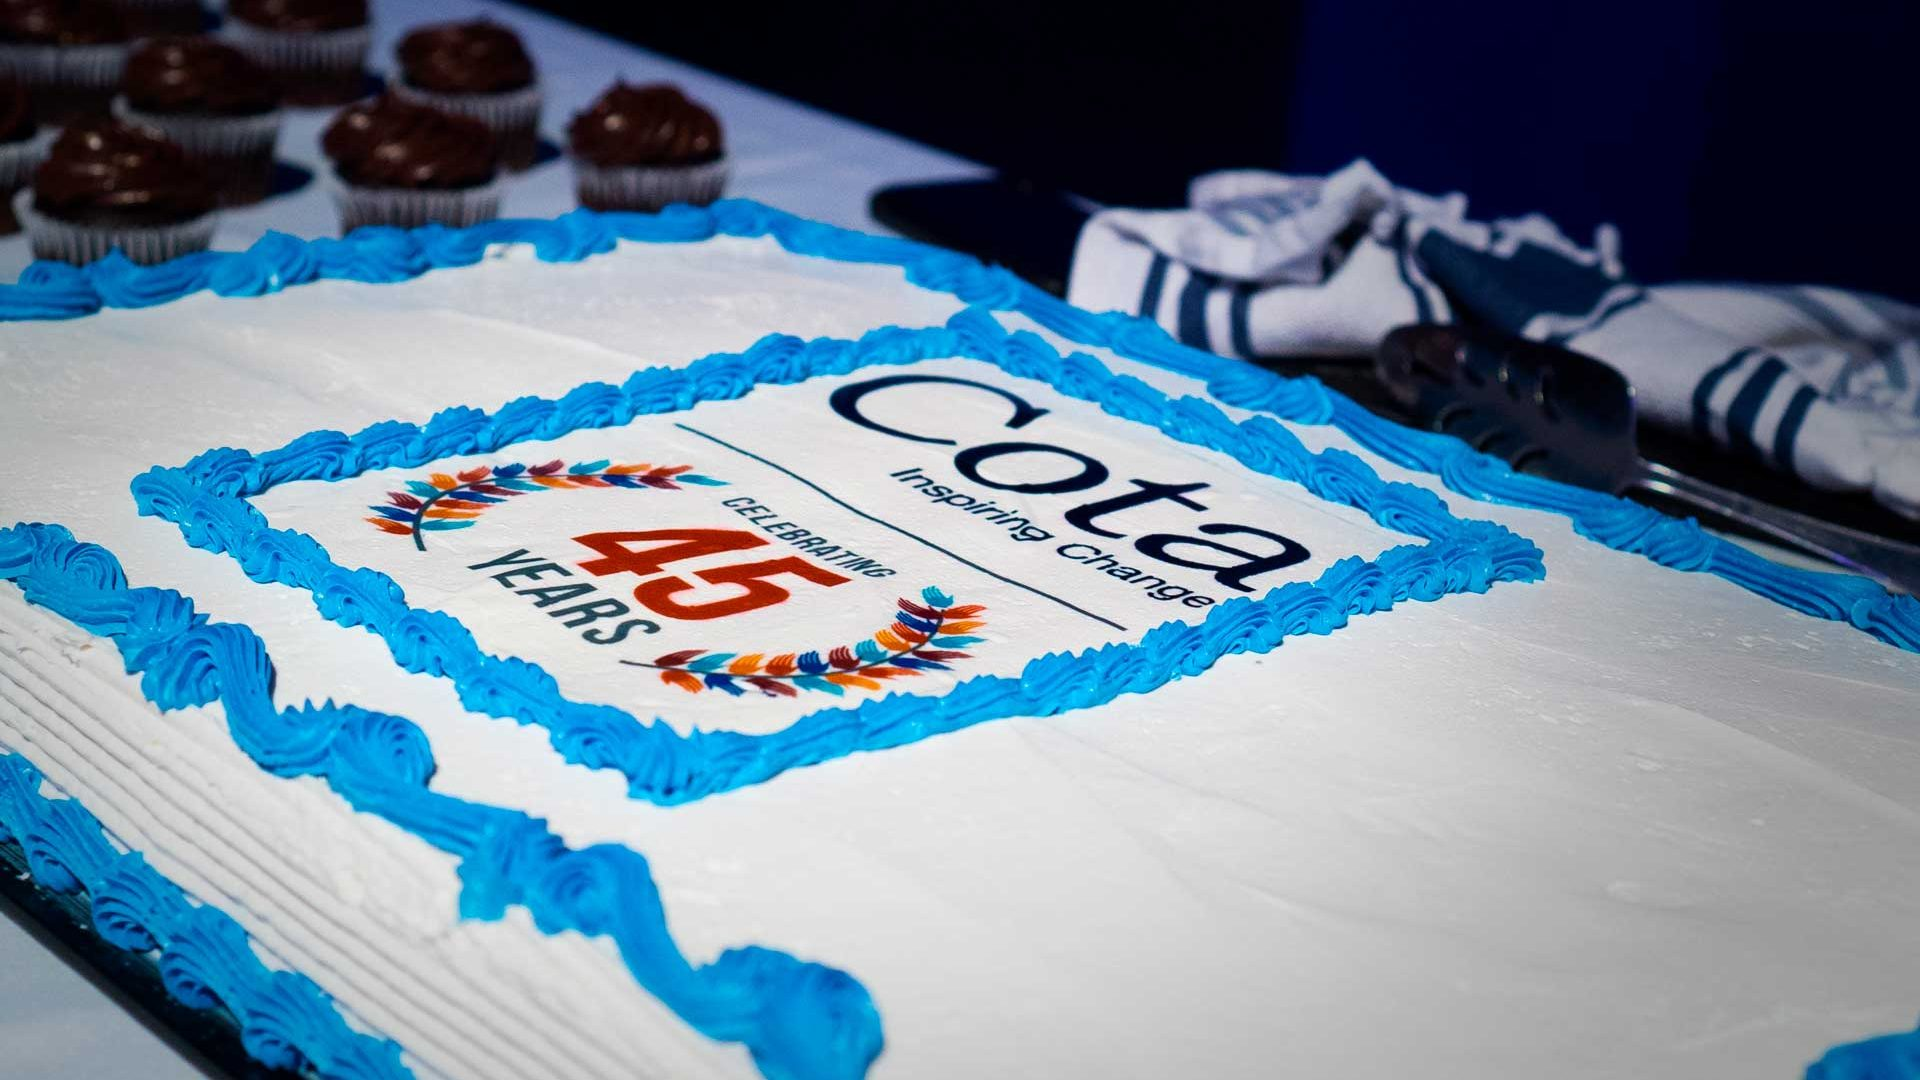 45 anniversary celebration cake at inspiring change award event